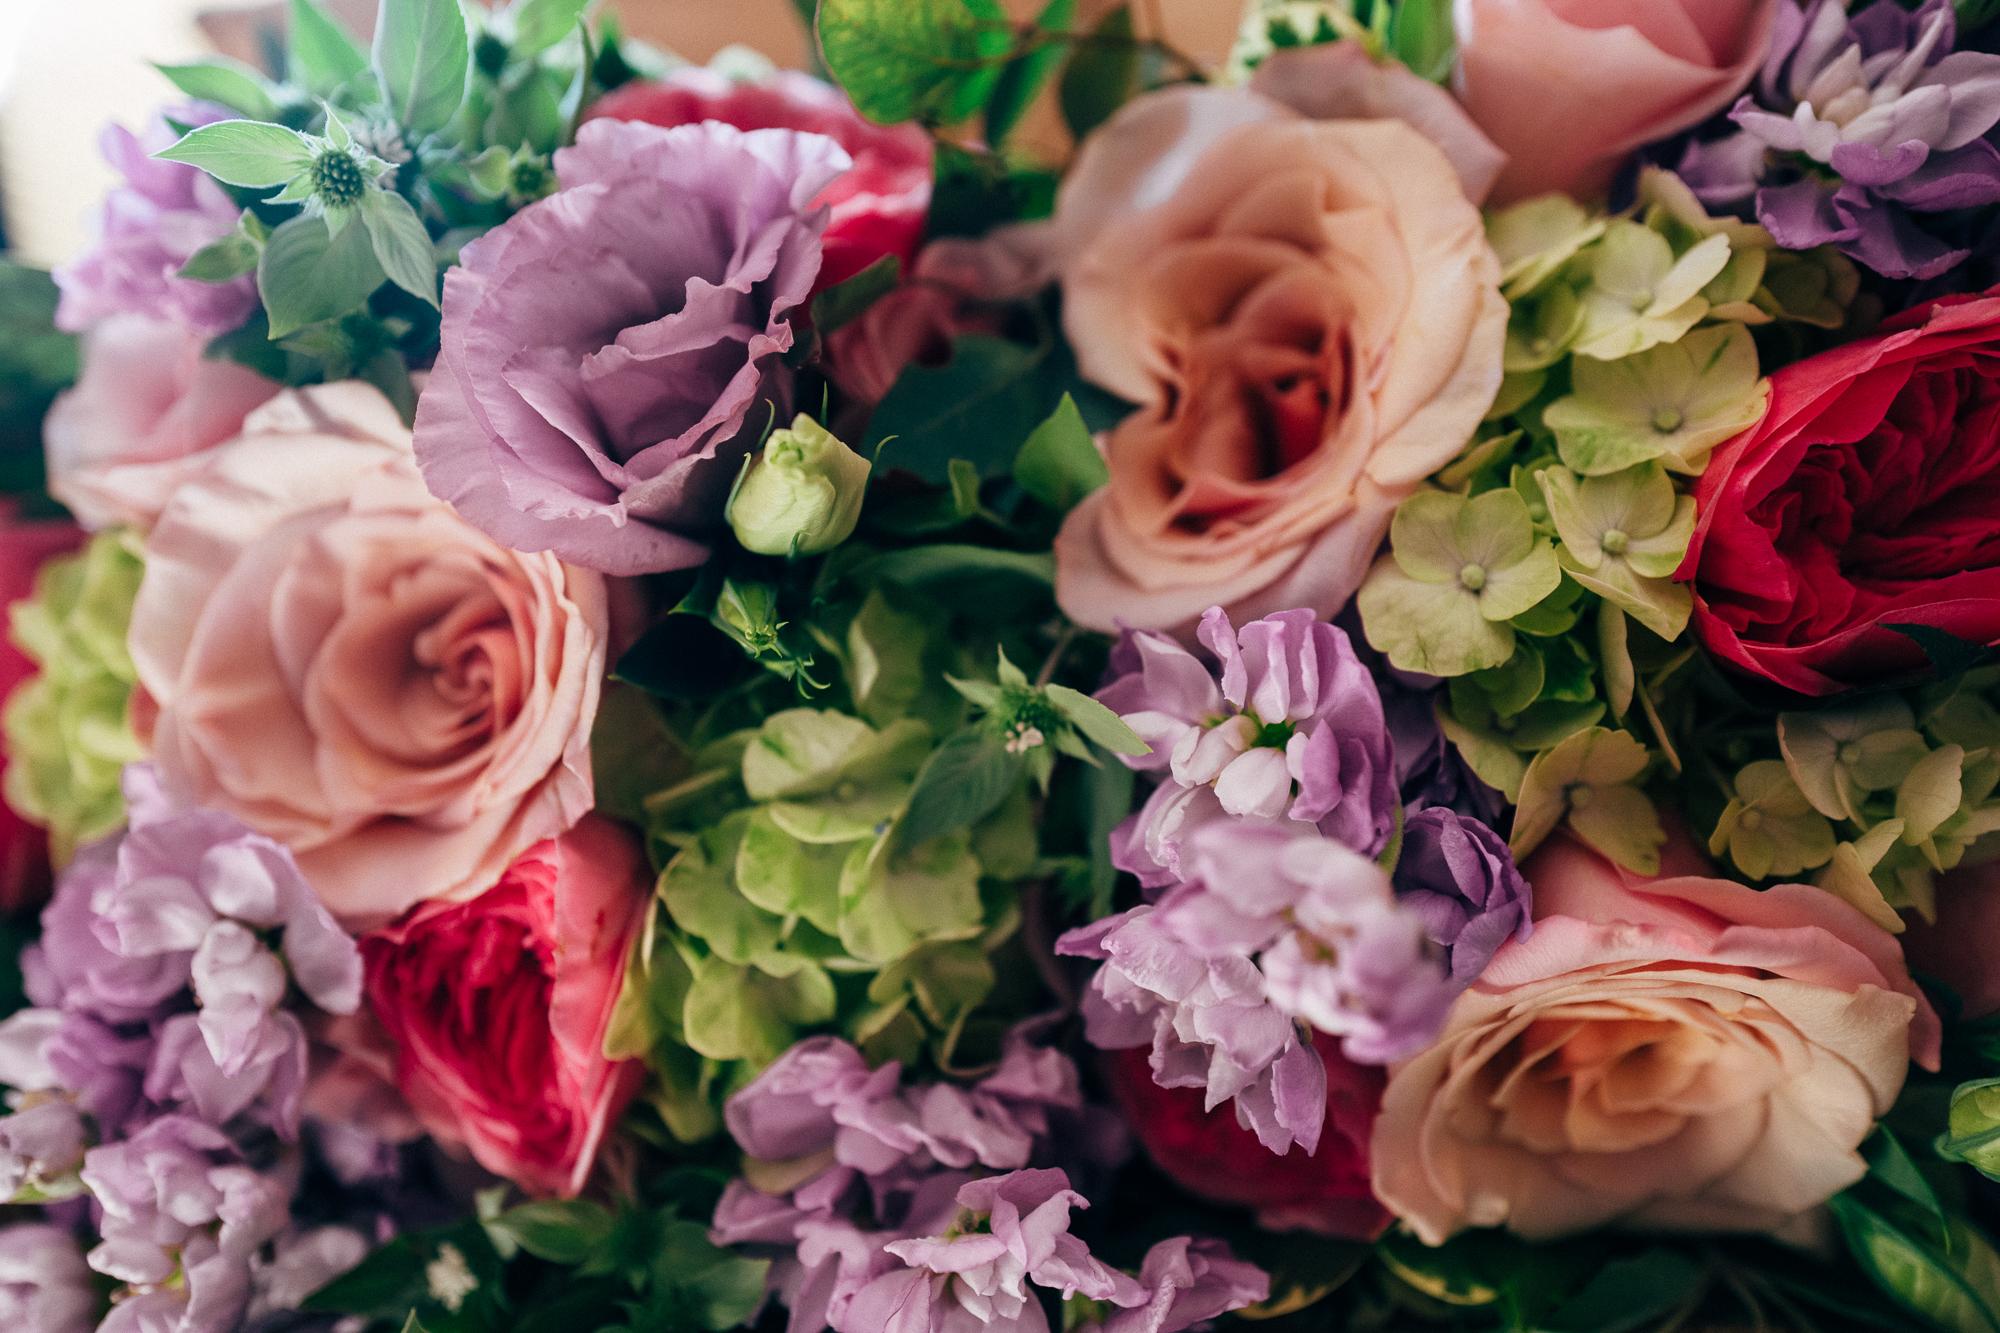 scranton-wedding-photography-zak-zavada-2016.06-rebeccaIan-0158.jpg